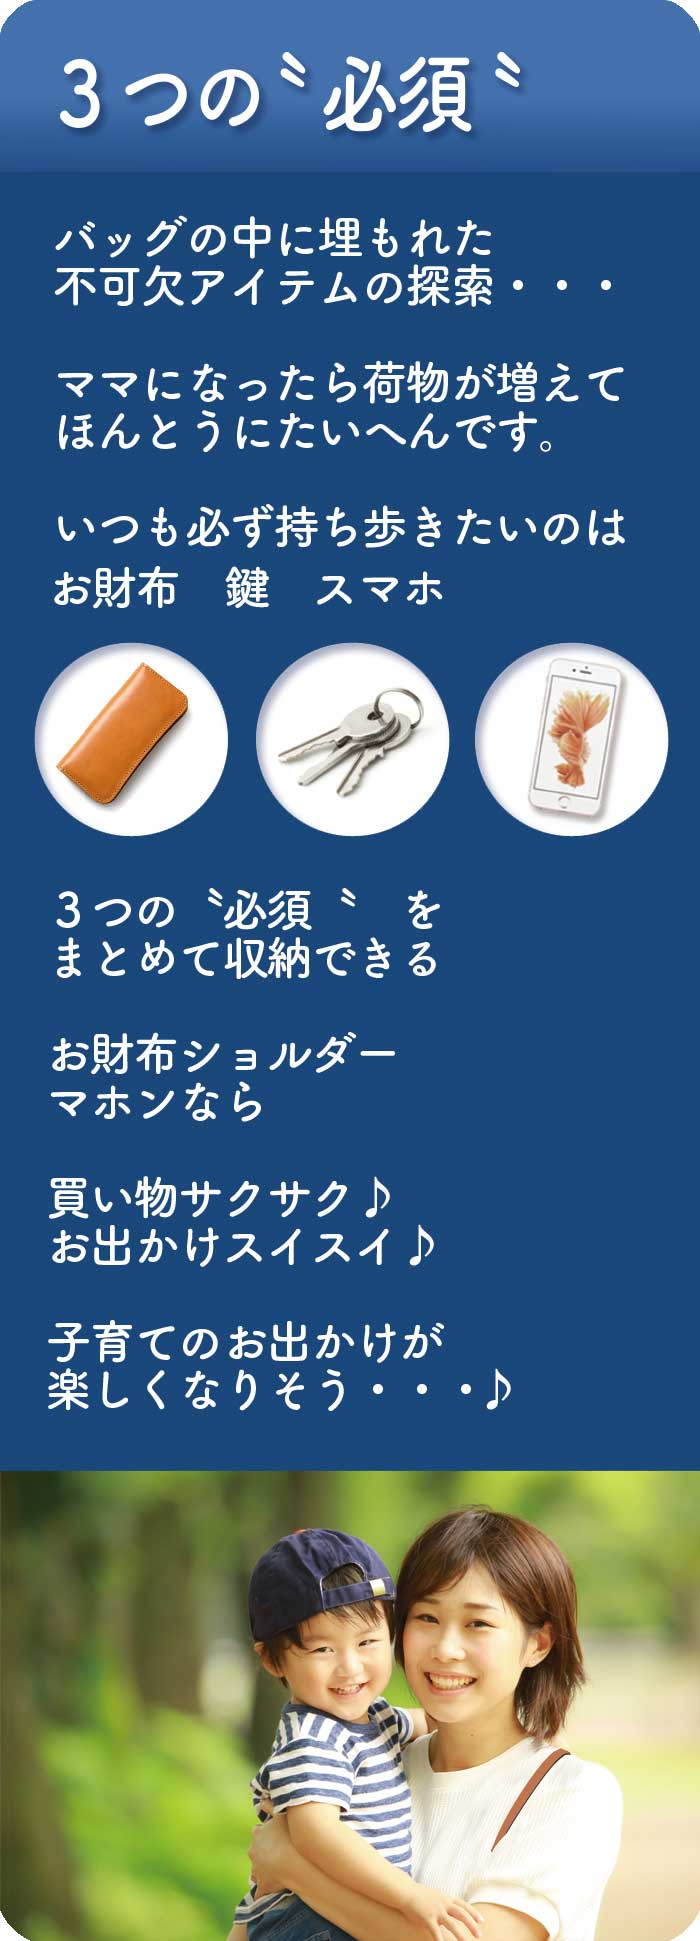 3 Tu hissuu02 - お財布ショルダーマホン